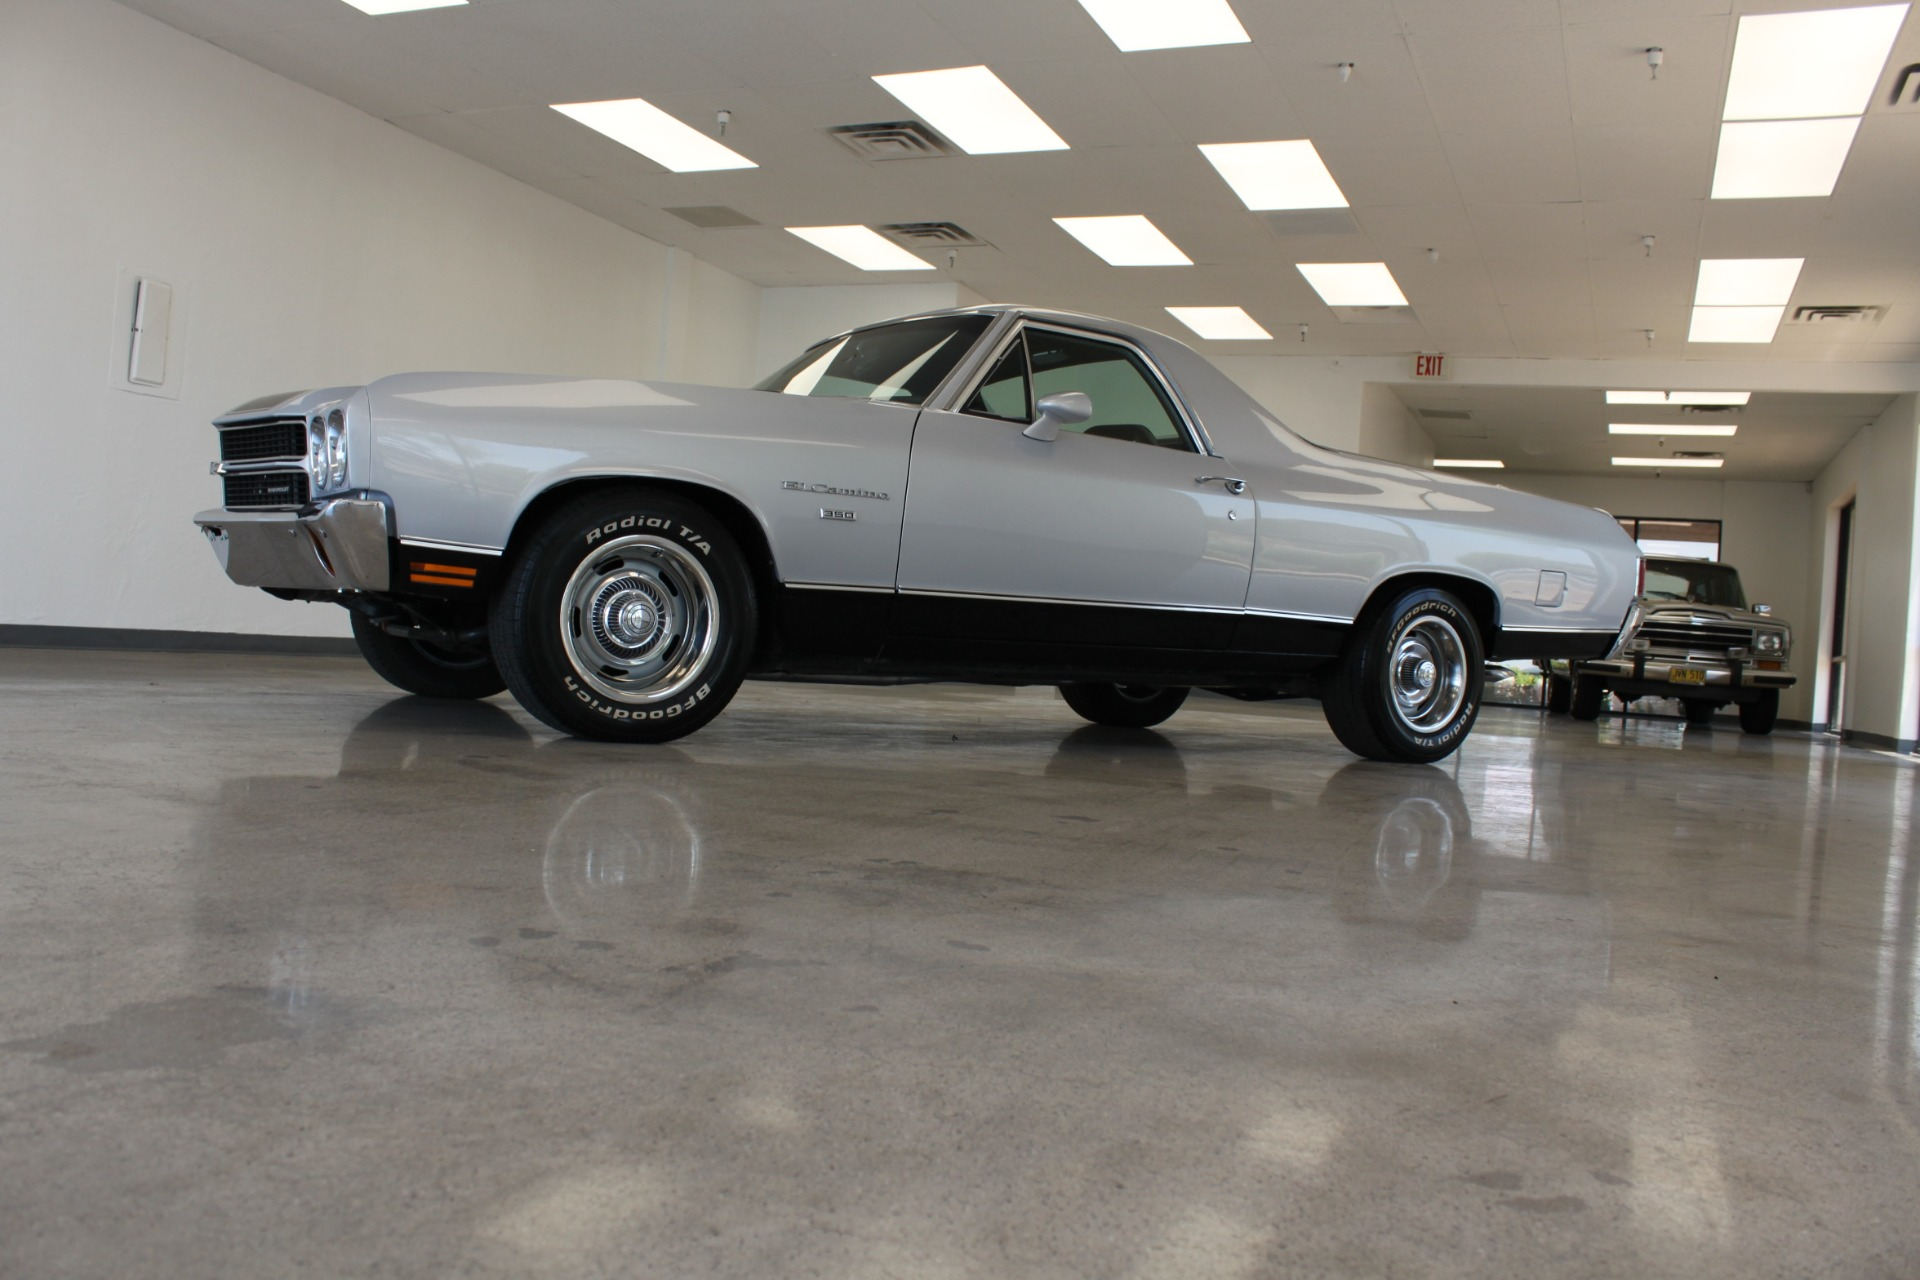 Used-1970-Chevrolet-El-Camino-Custom-350-ci-Camaro